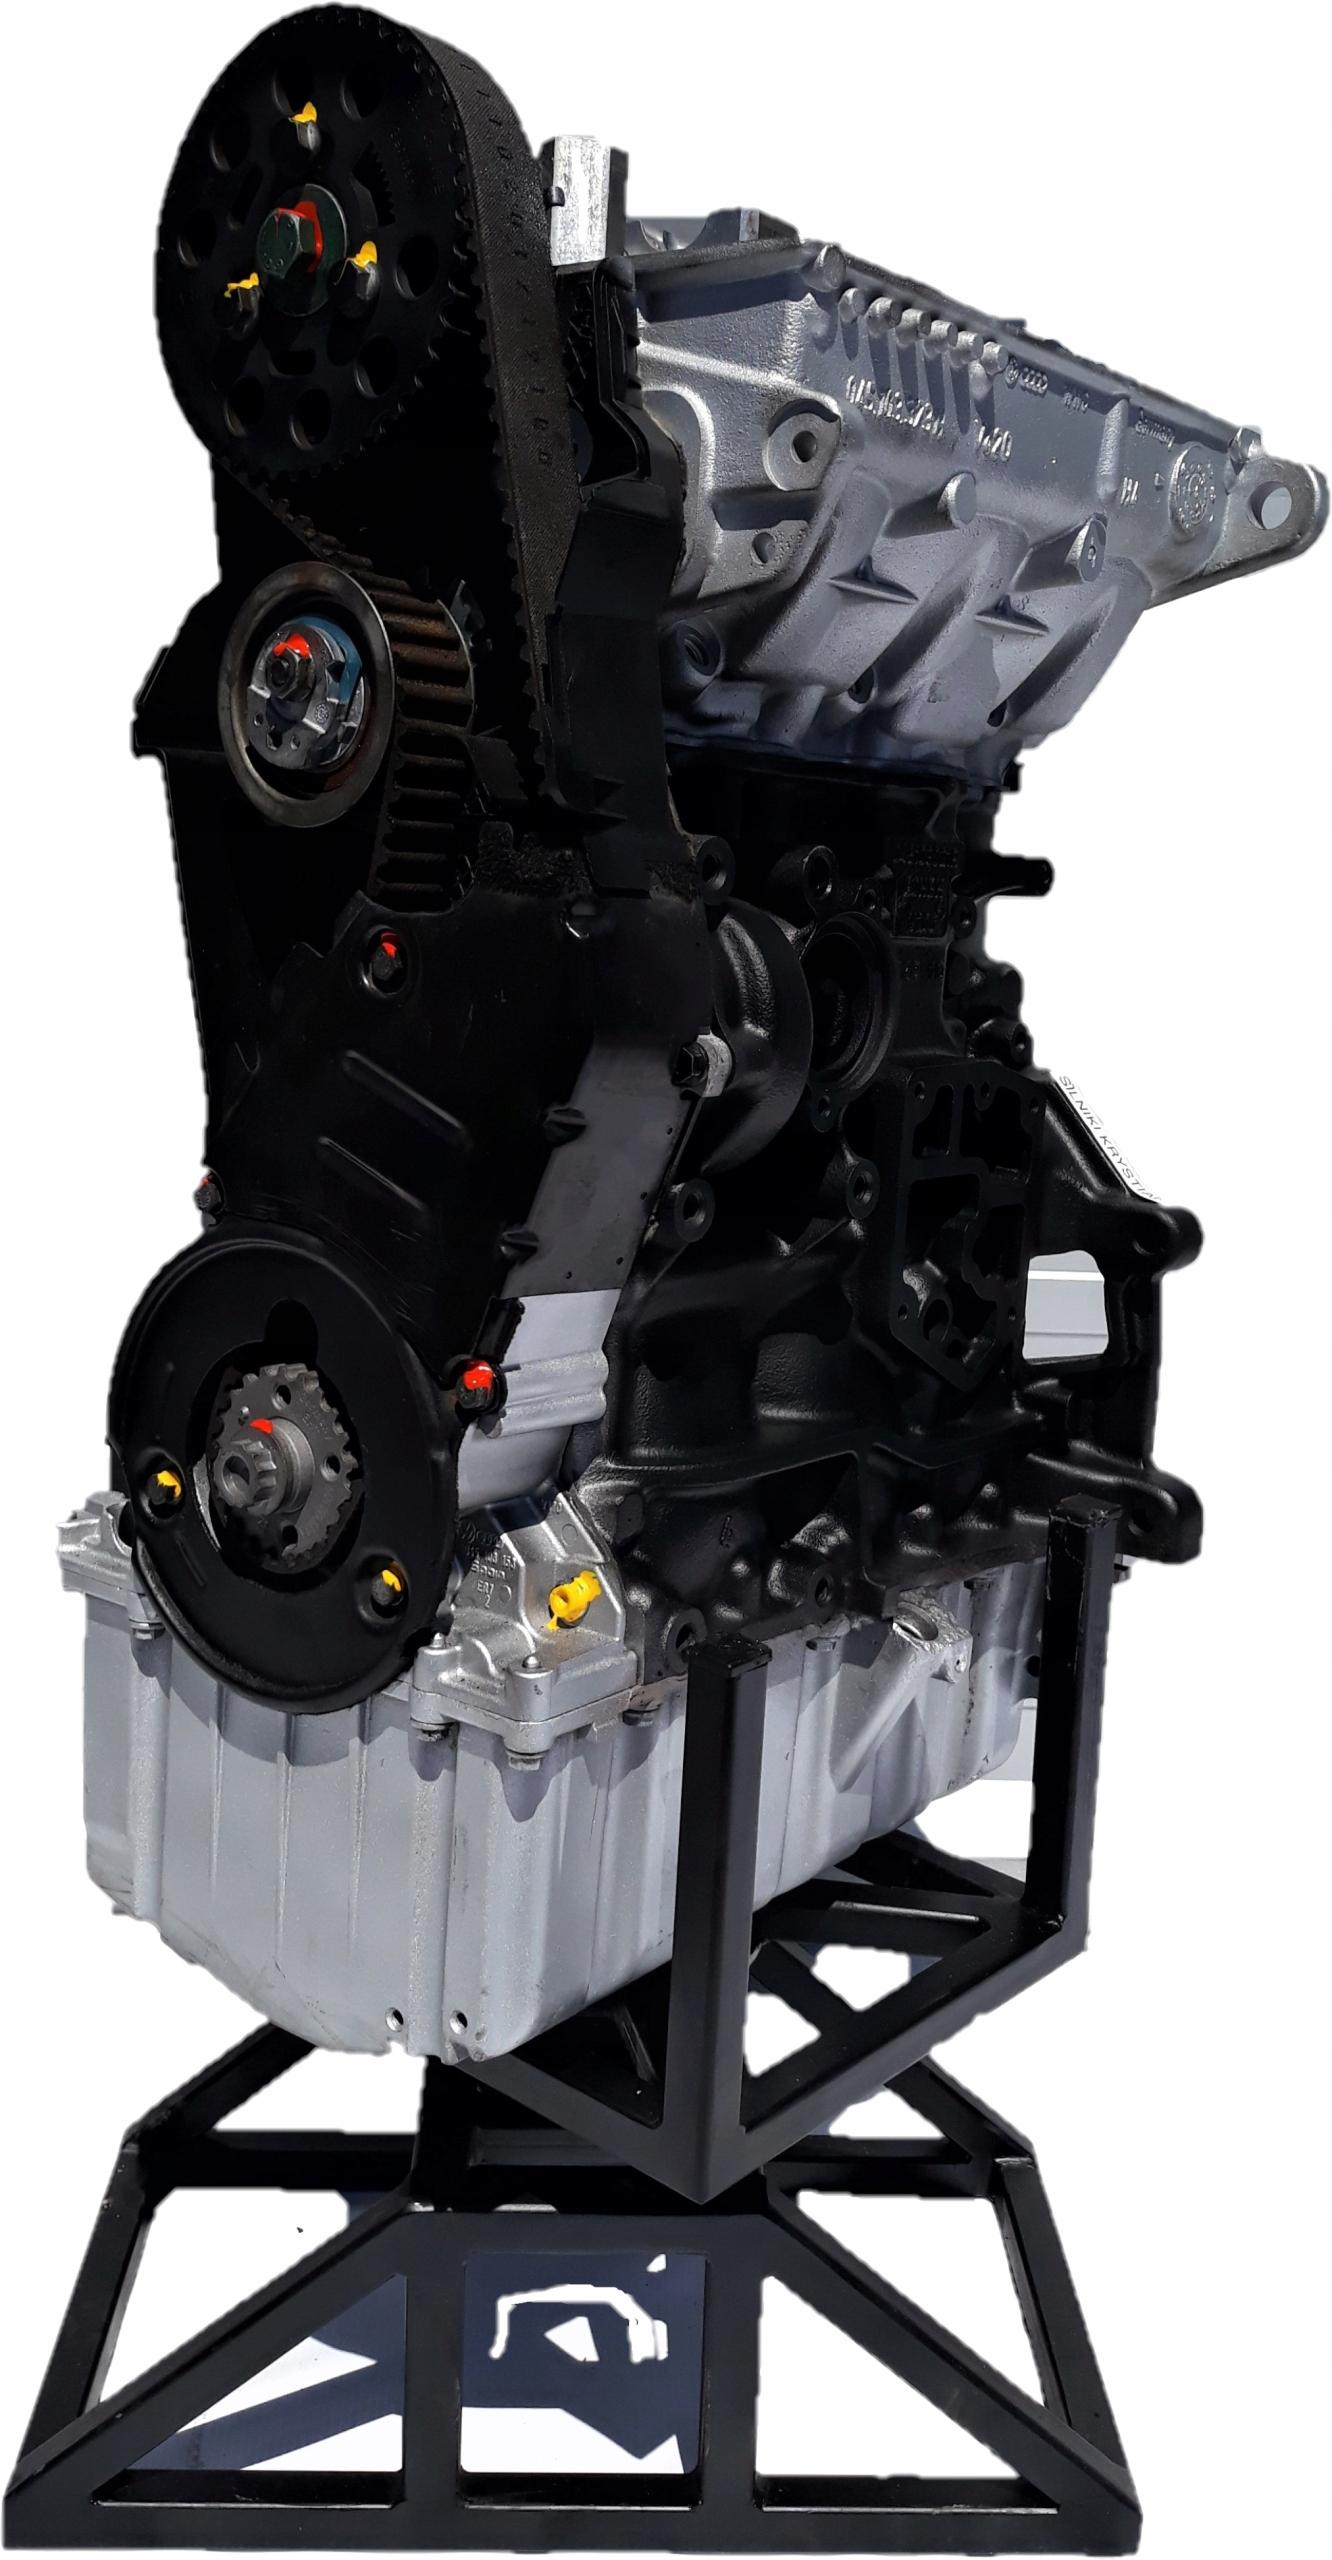 двигатель bms skoda 14 6v tdi гарантия